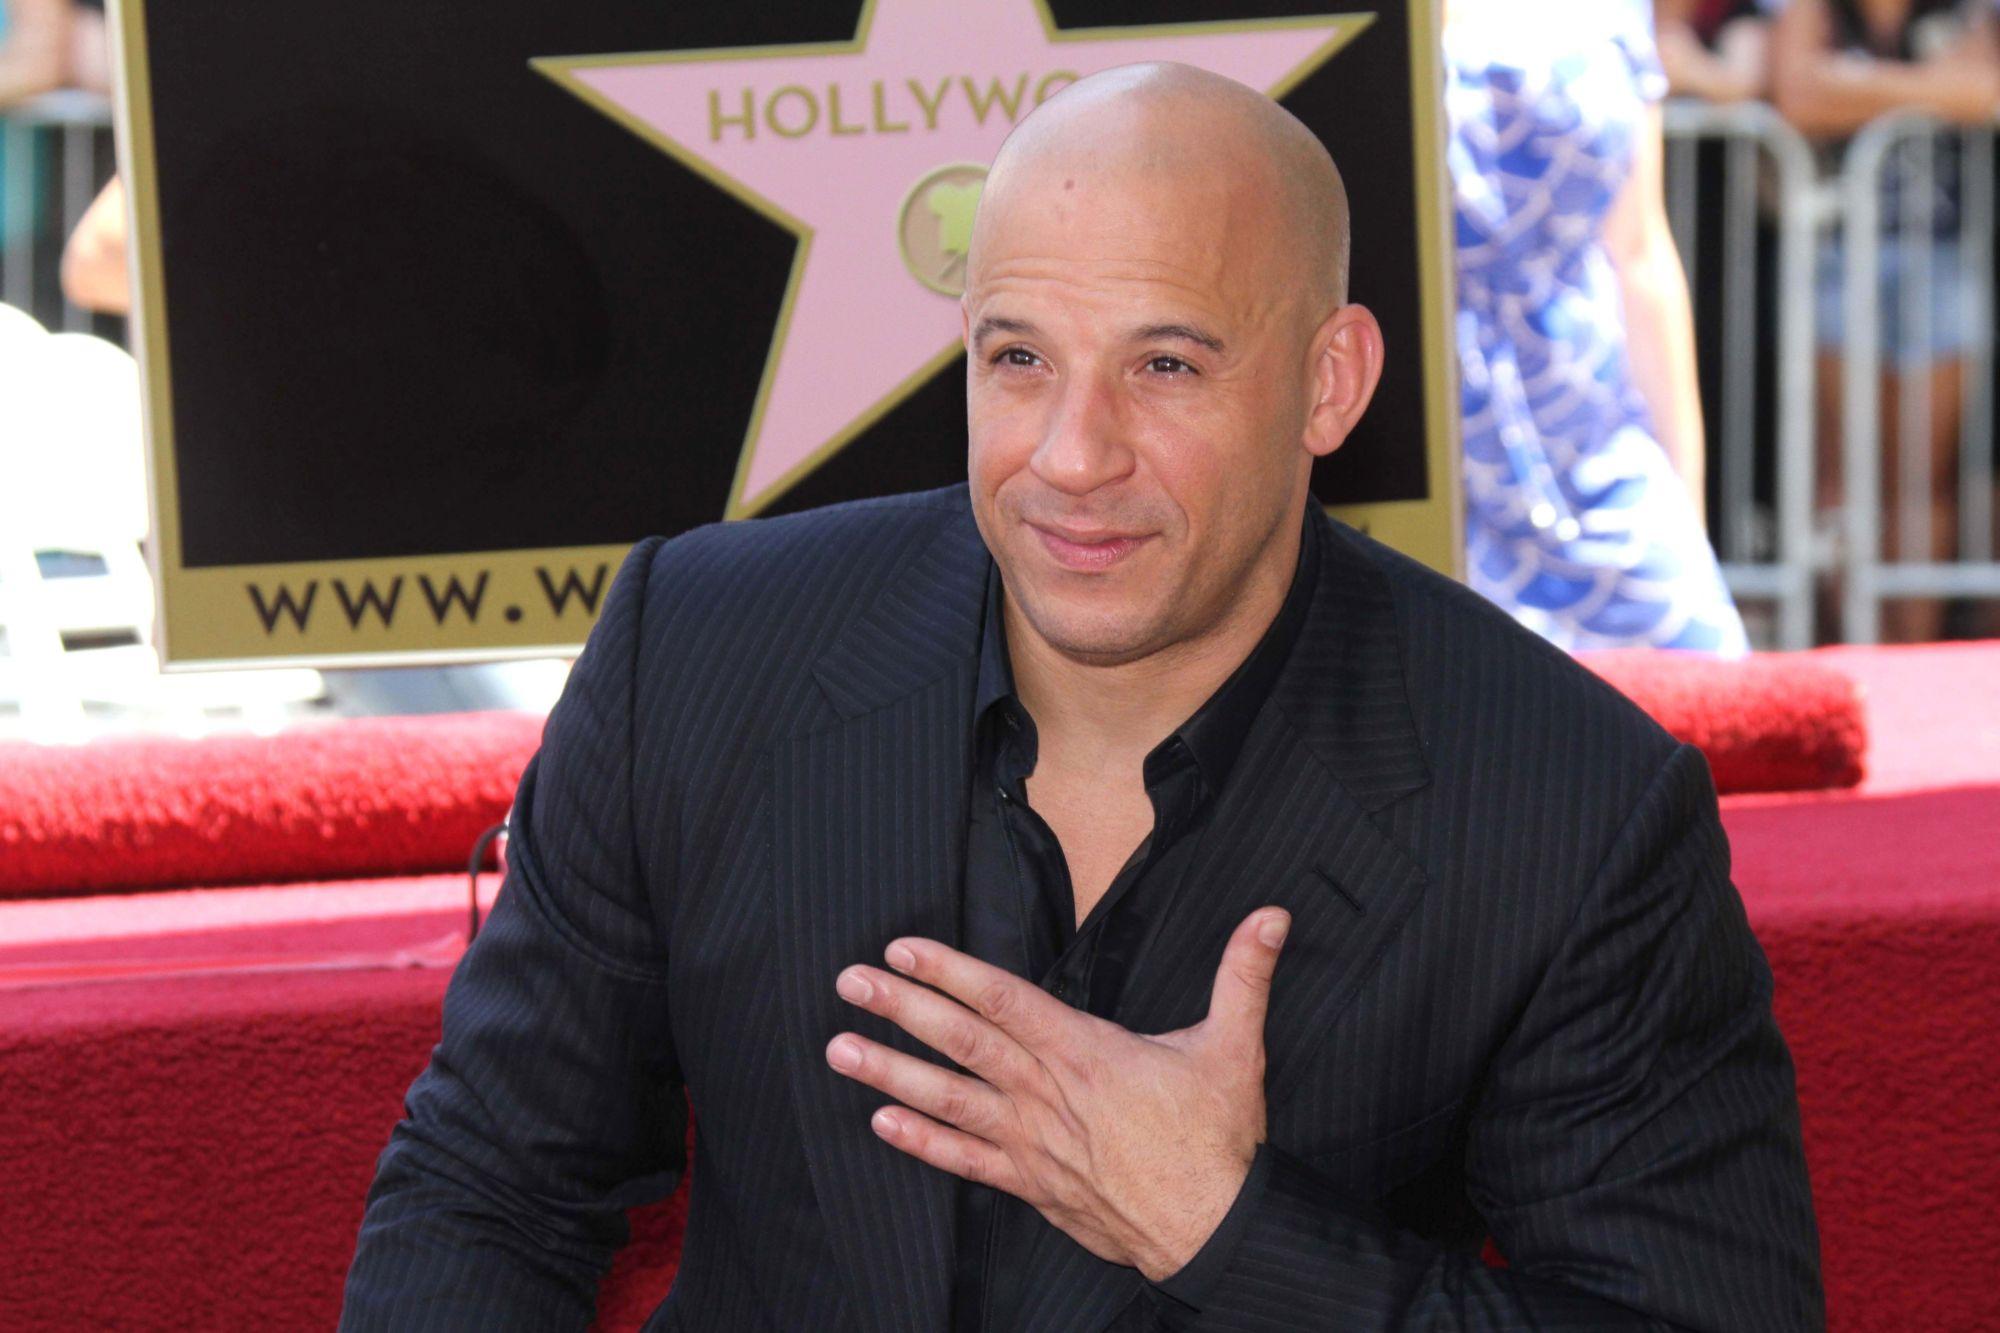 Vin Diesel Says Steven Spielberg Told Him to Direct More Films